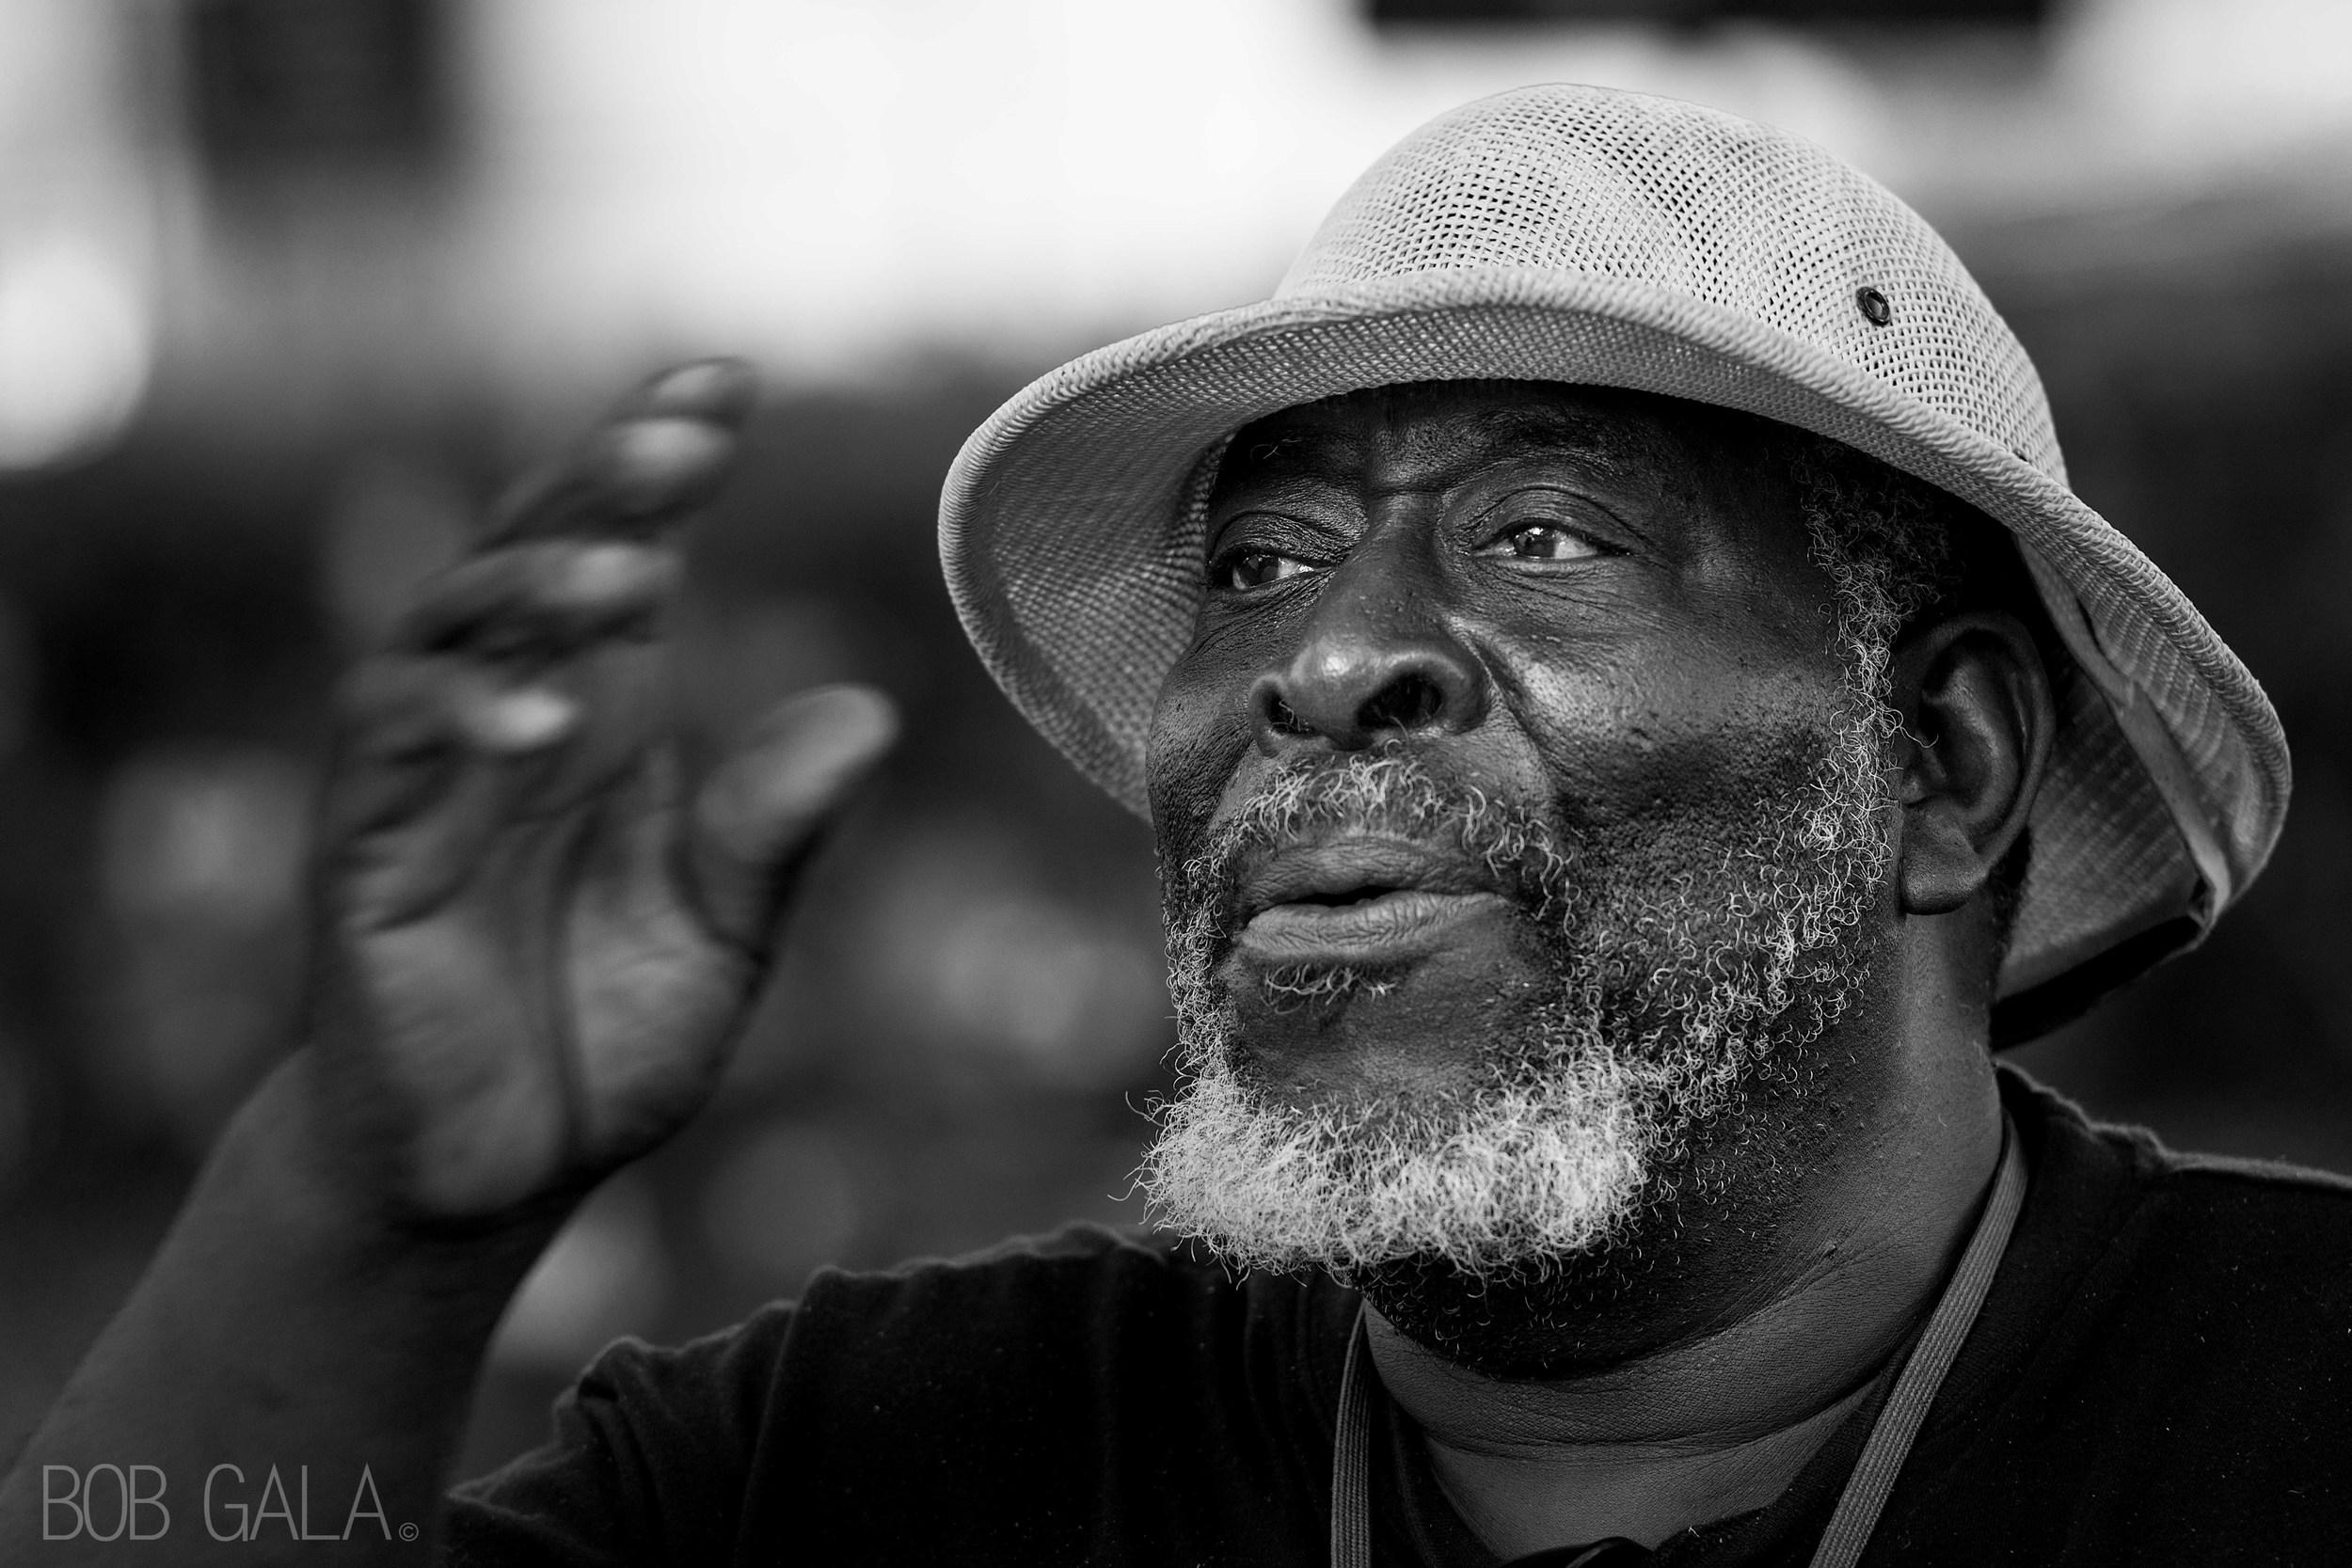 Bob_Gala_Portrait_Photography-6.jpg